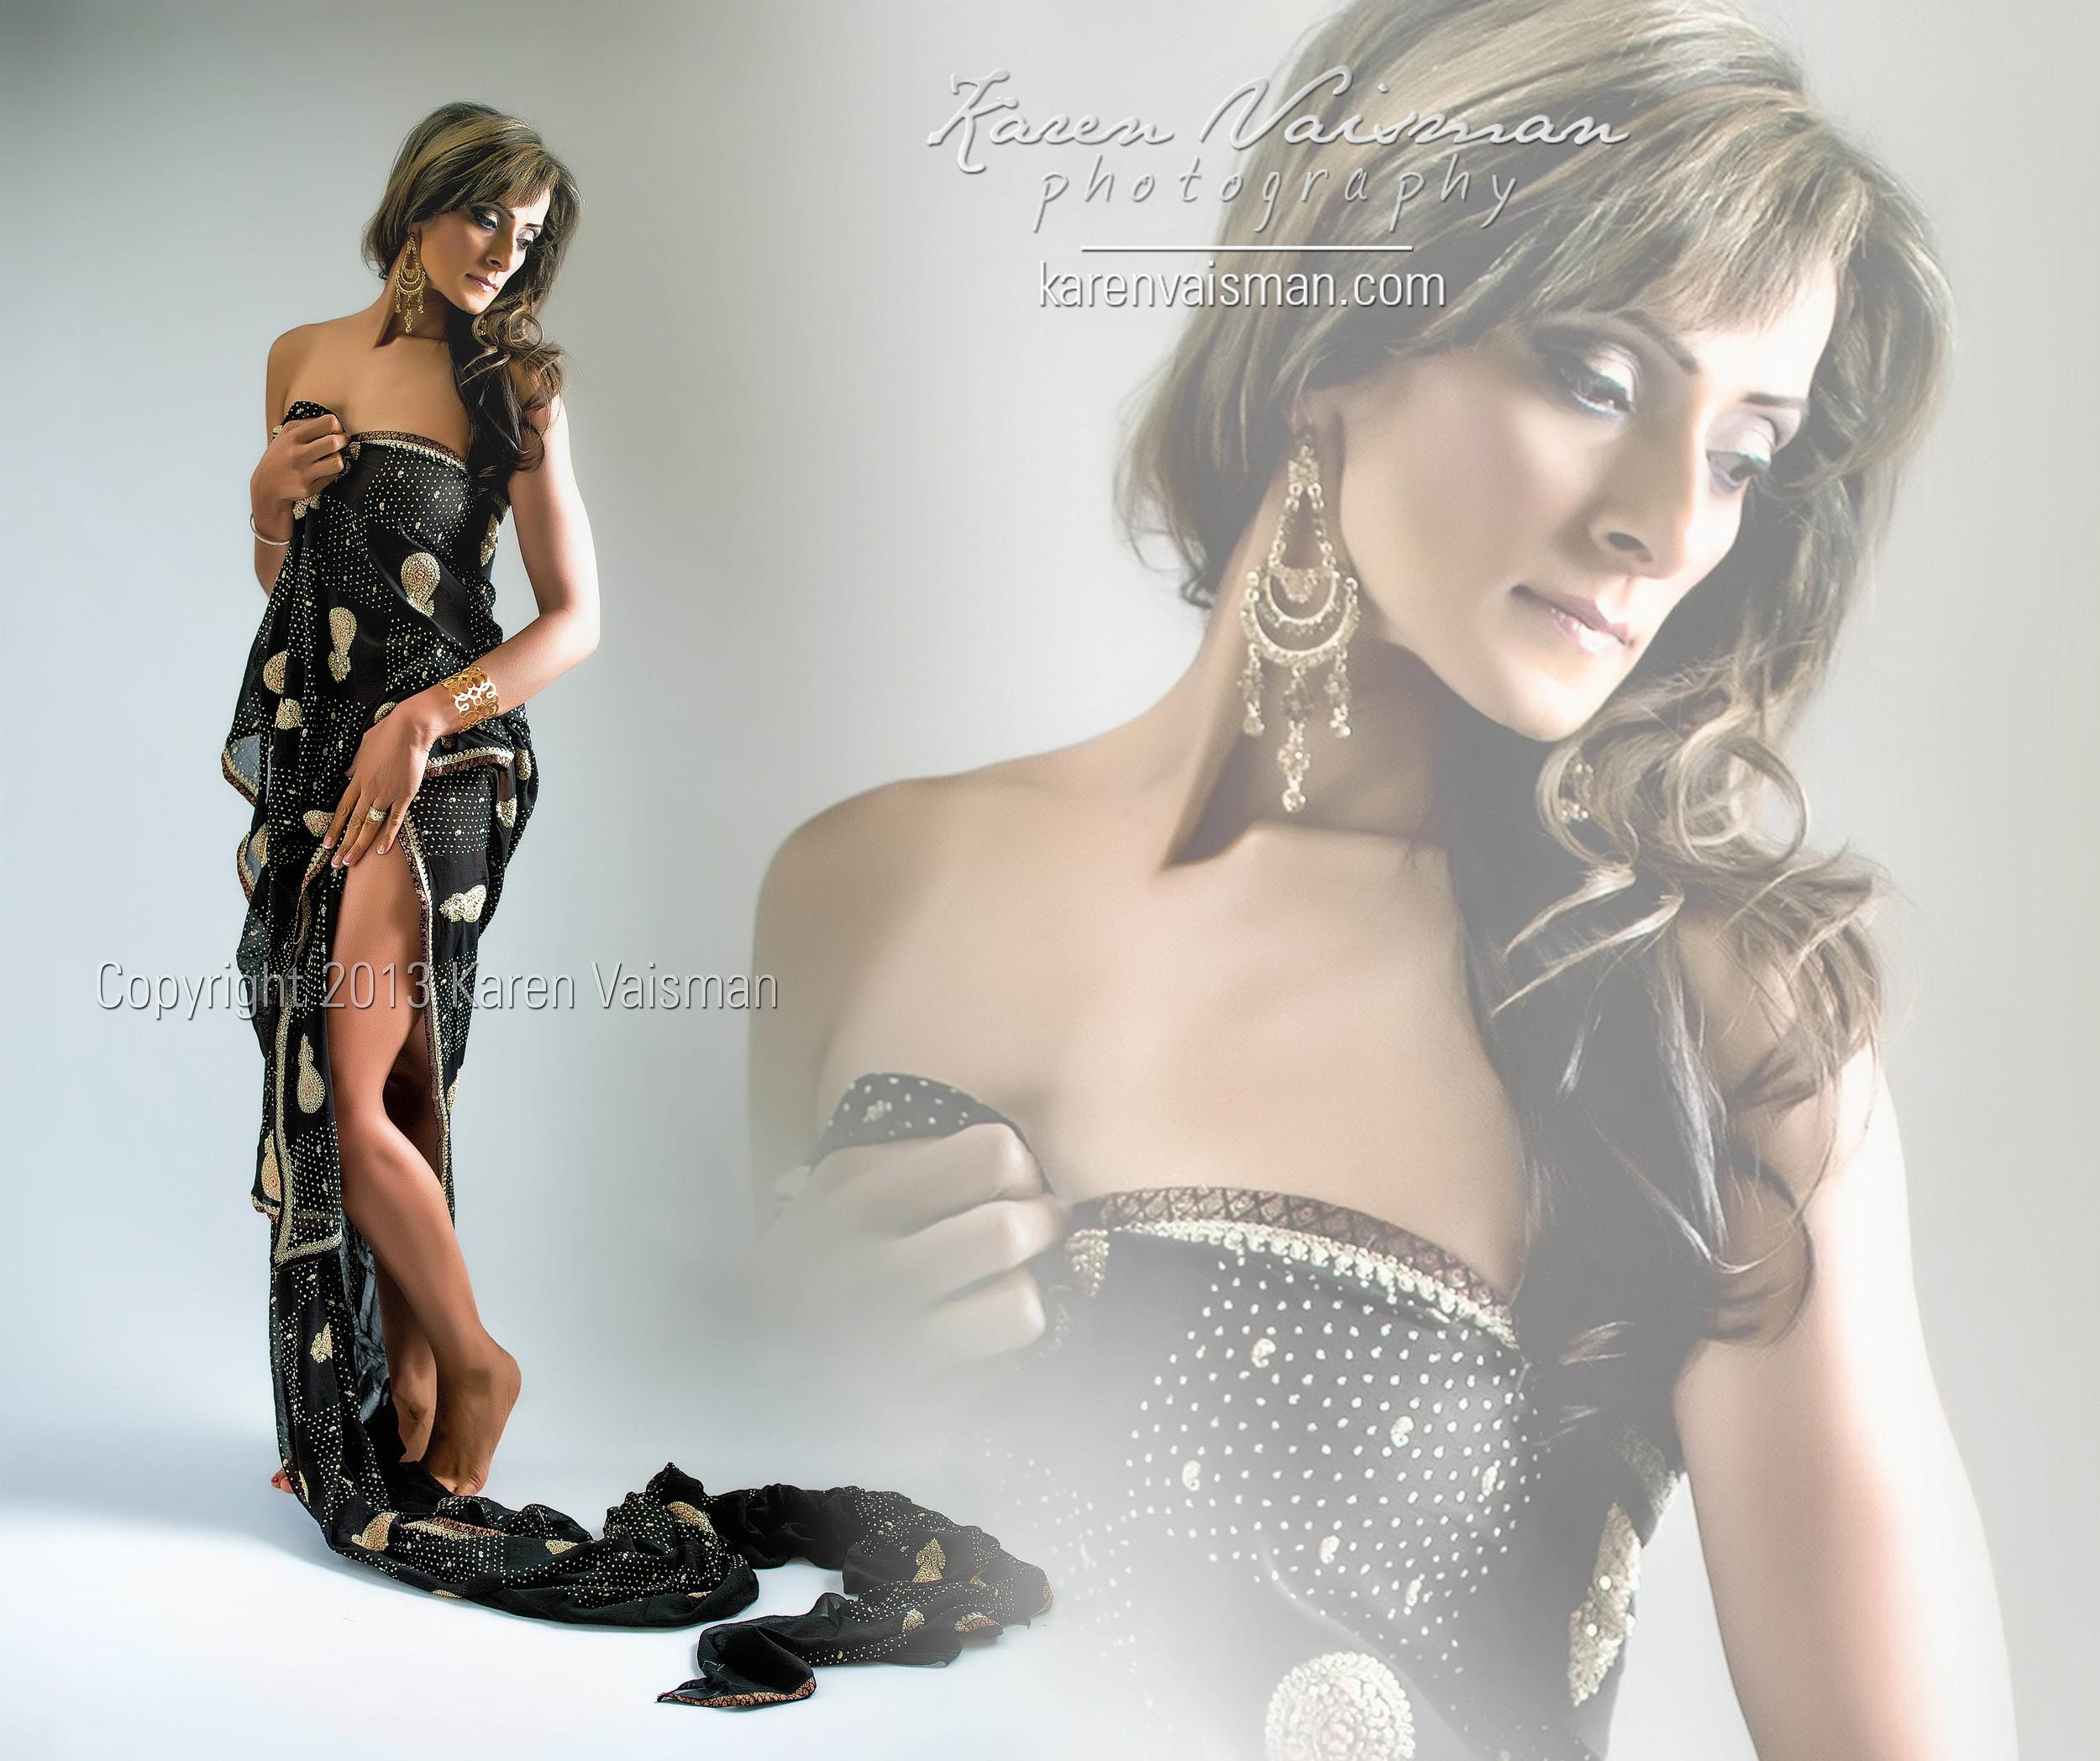 Beautiful Portraiture Makes a Great Gift for Hubby! Agoura Hills - Karen Vaisman Photography (818) 991-7787